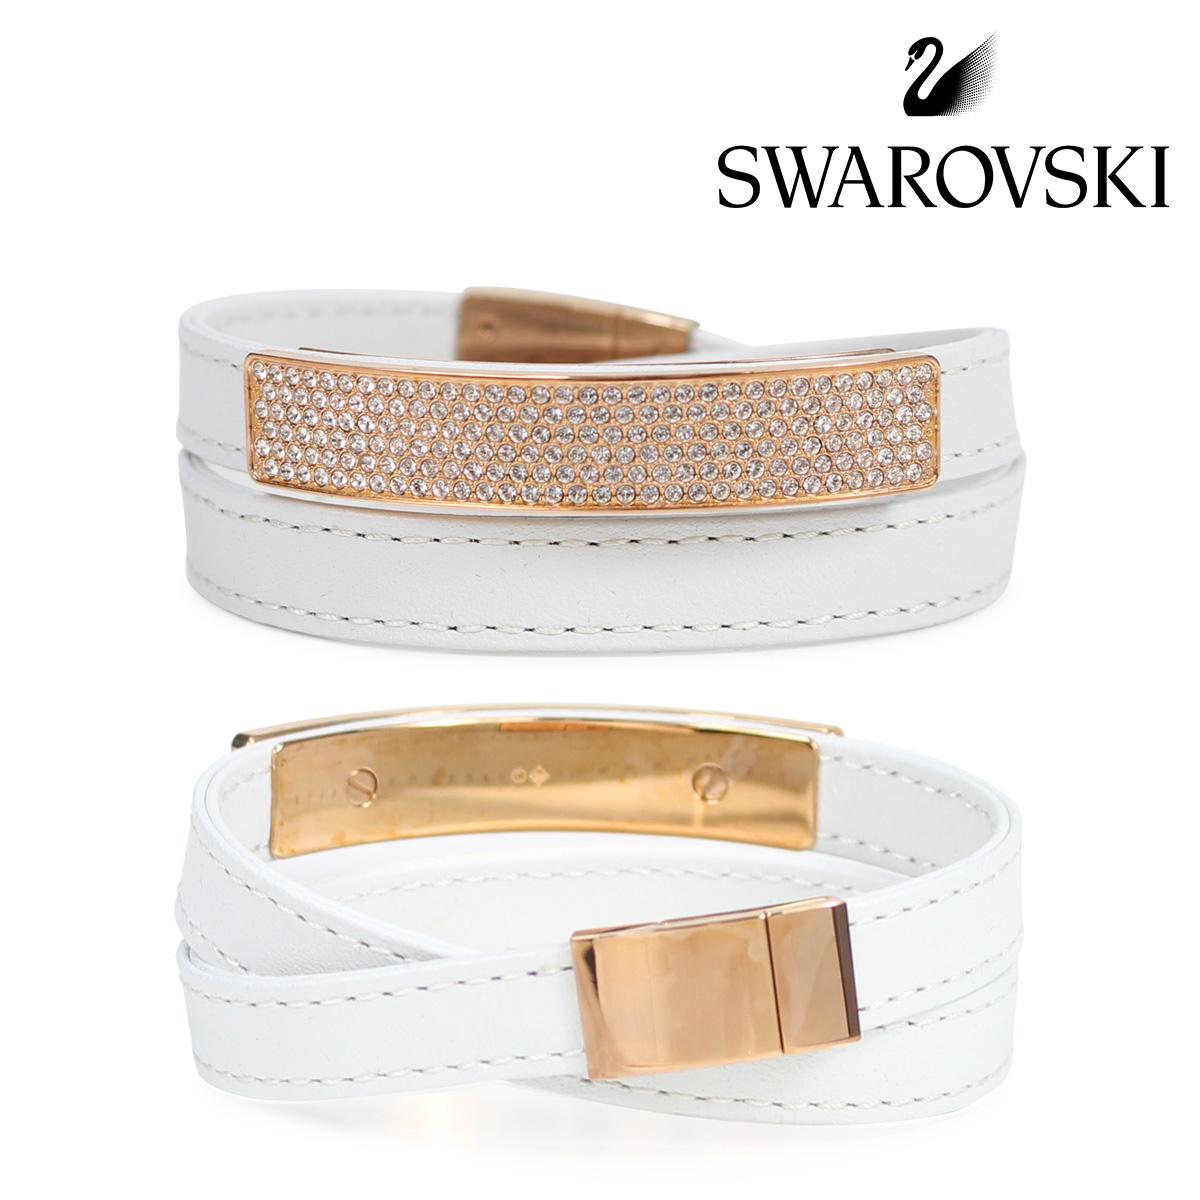 SWAROVSKI スワロフスキー ブレスレット レディース VIO ホワイト 5134617